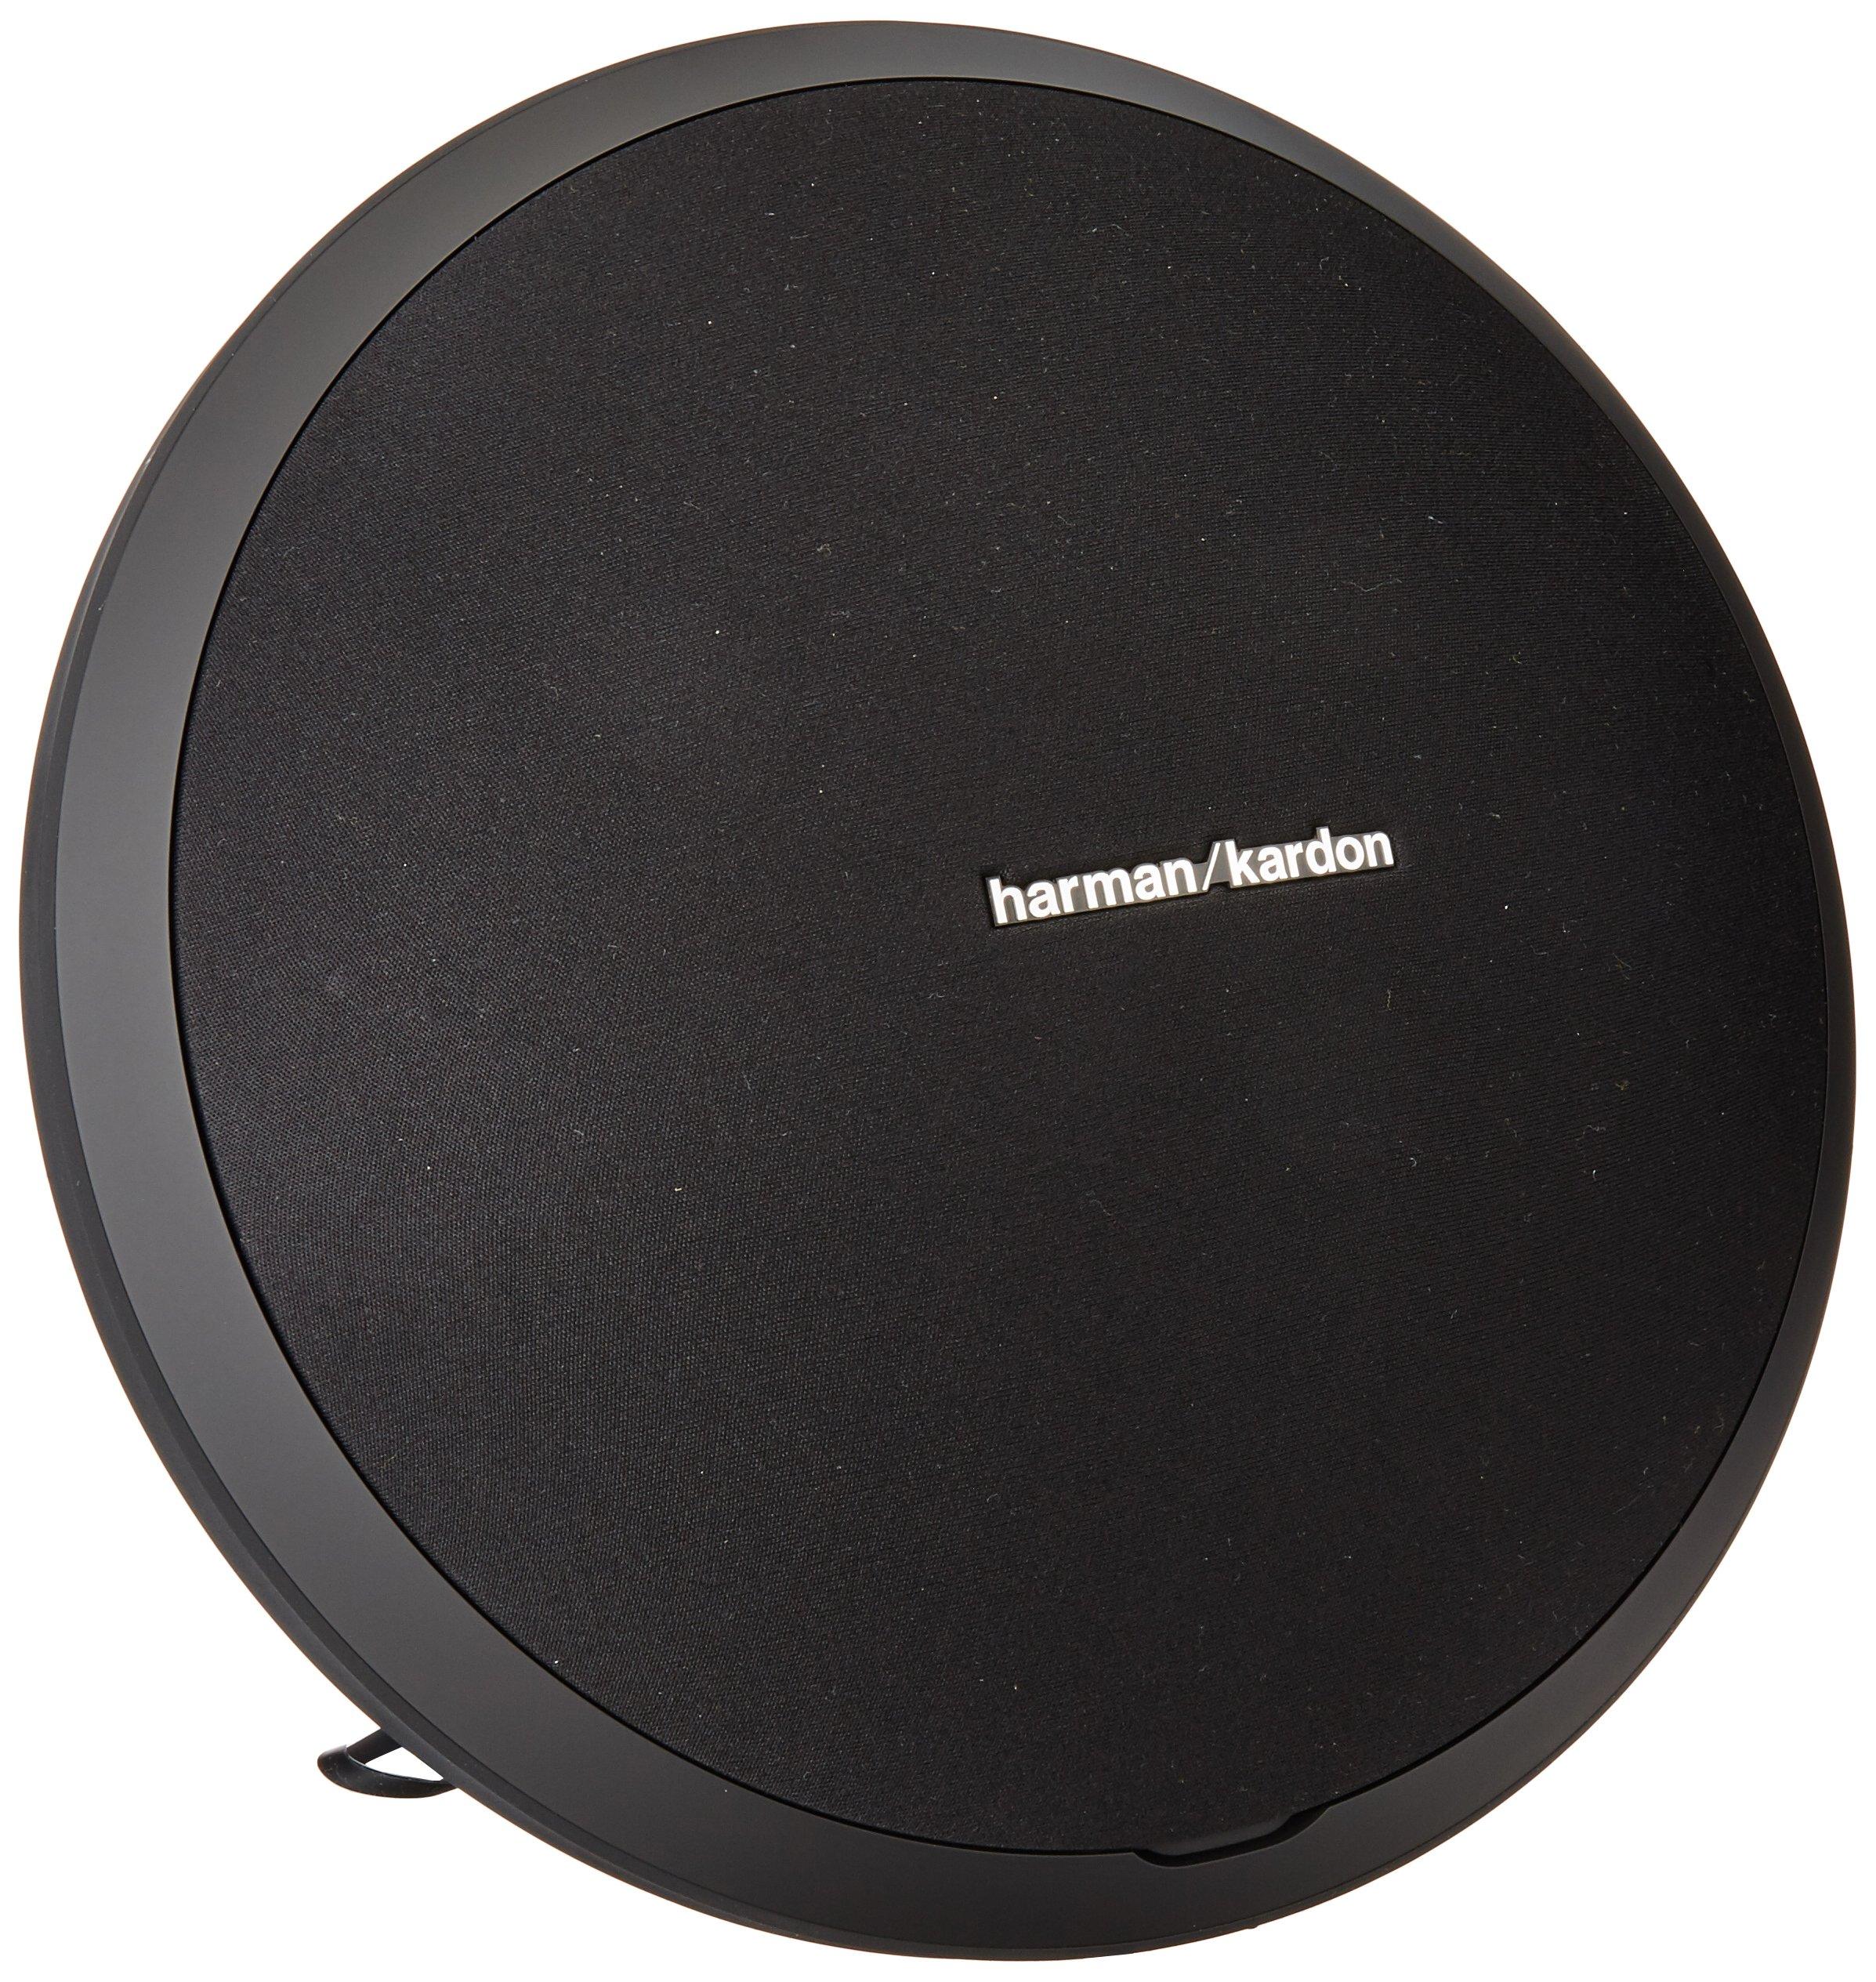 Harman Kardon Onyx Studio Wireless Bluetooth Speaker with rechargeable battery by Harman Kardon (Image #2)